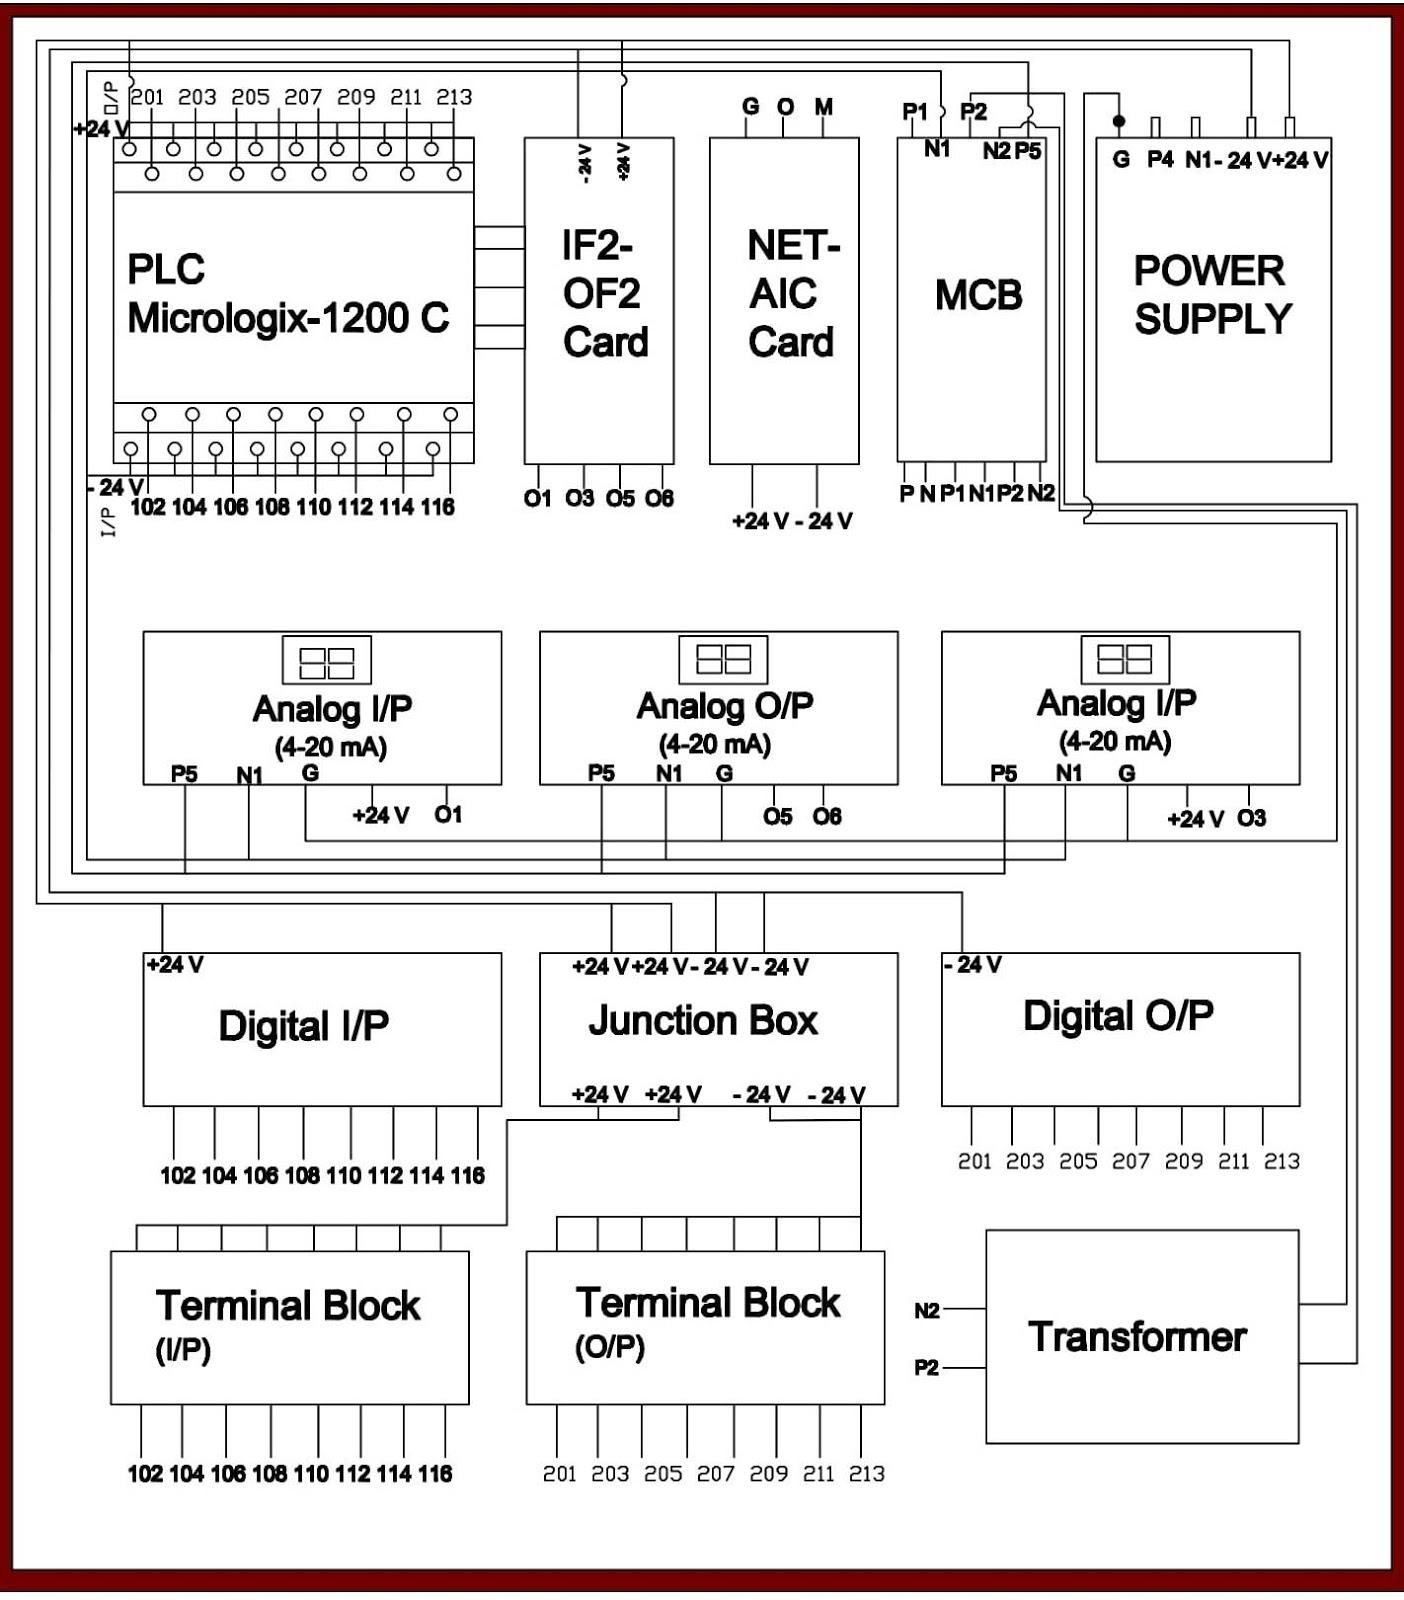 ab micrologix 1400 wiring diagram seven plug trailer 1200 30 images